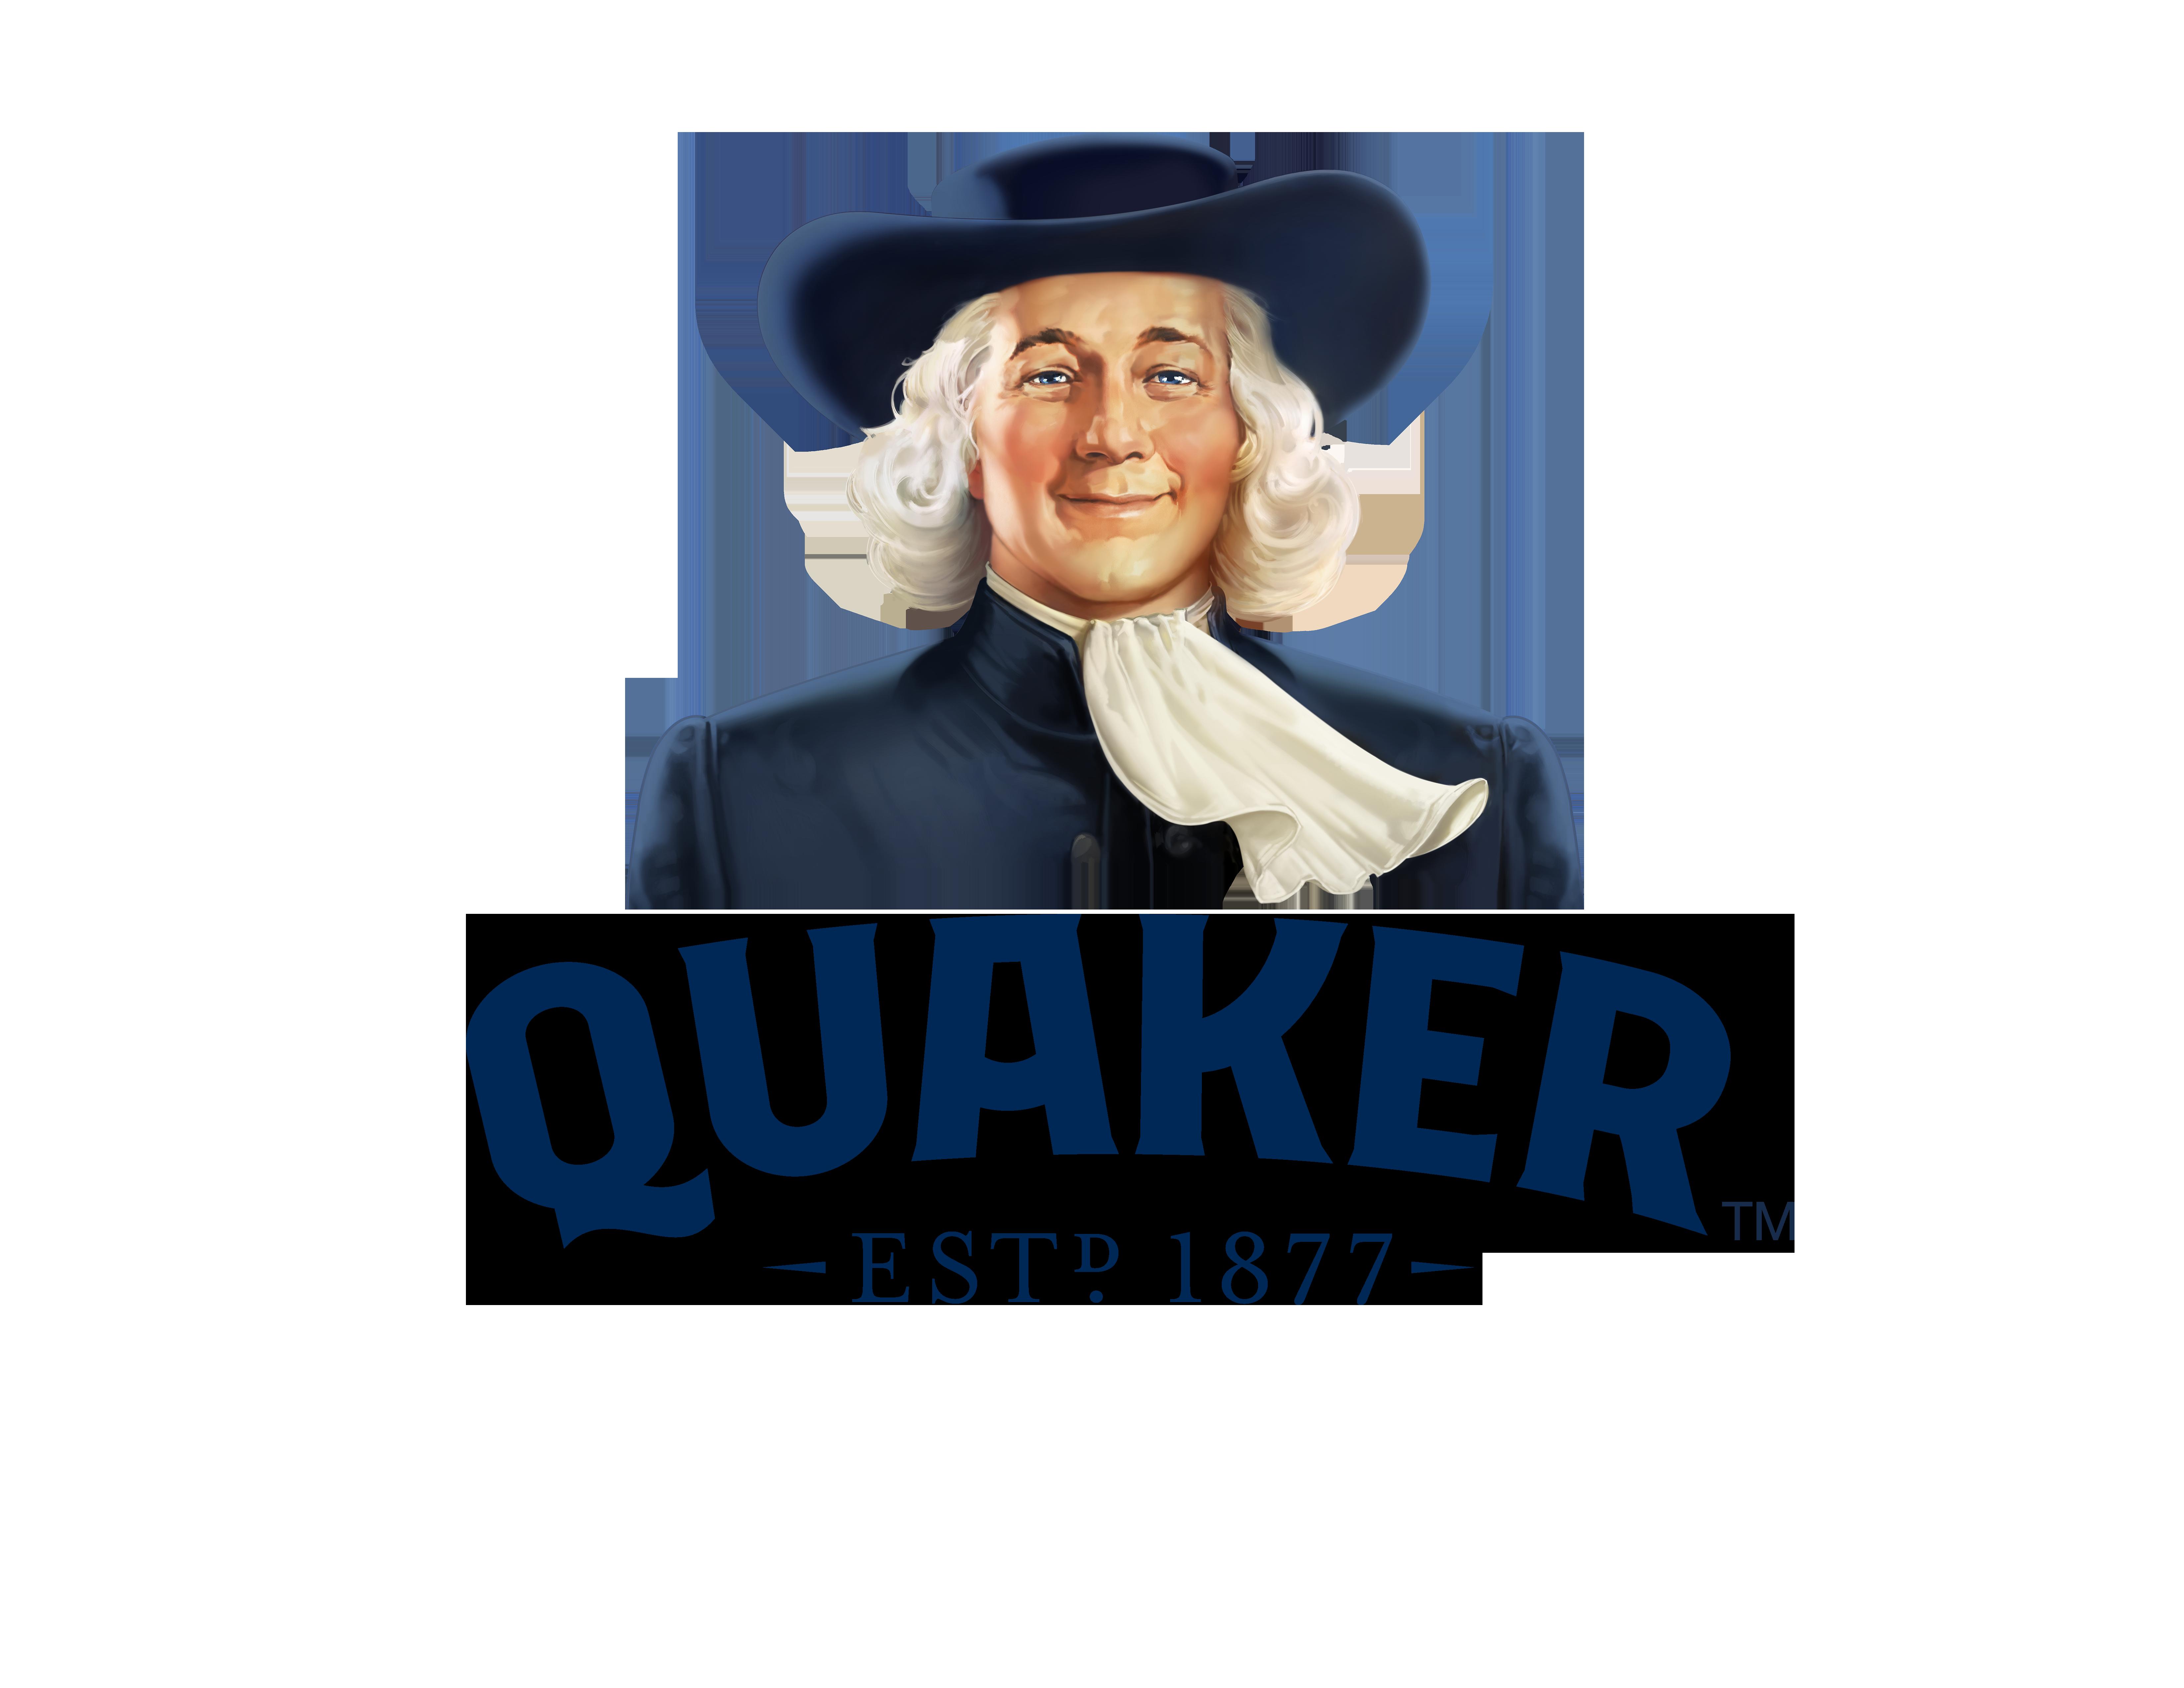 Quaker Oats-logo